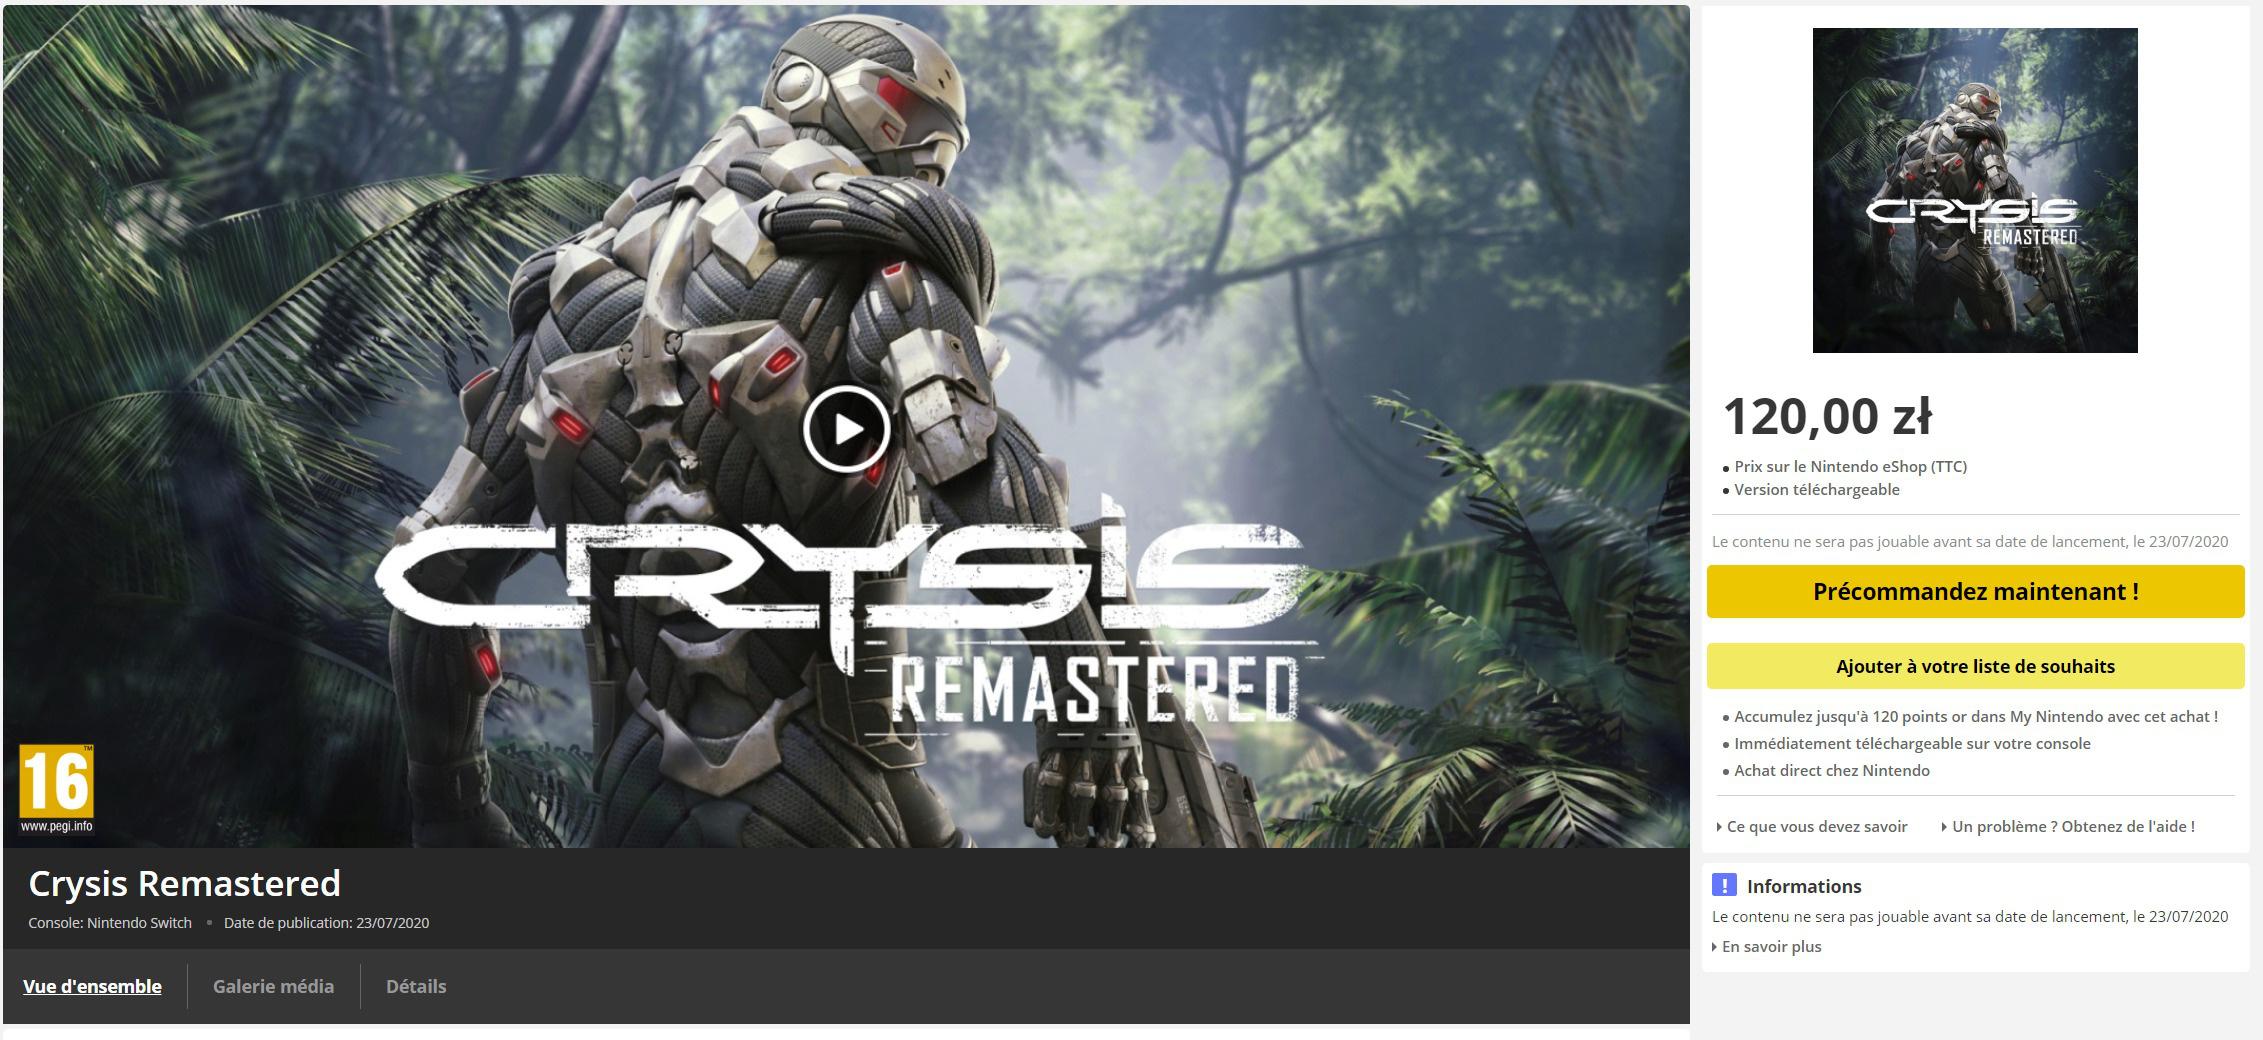 Crysis Remastered na Nintendo Switch